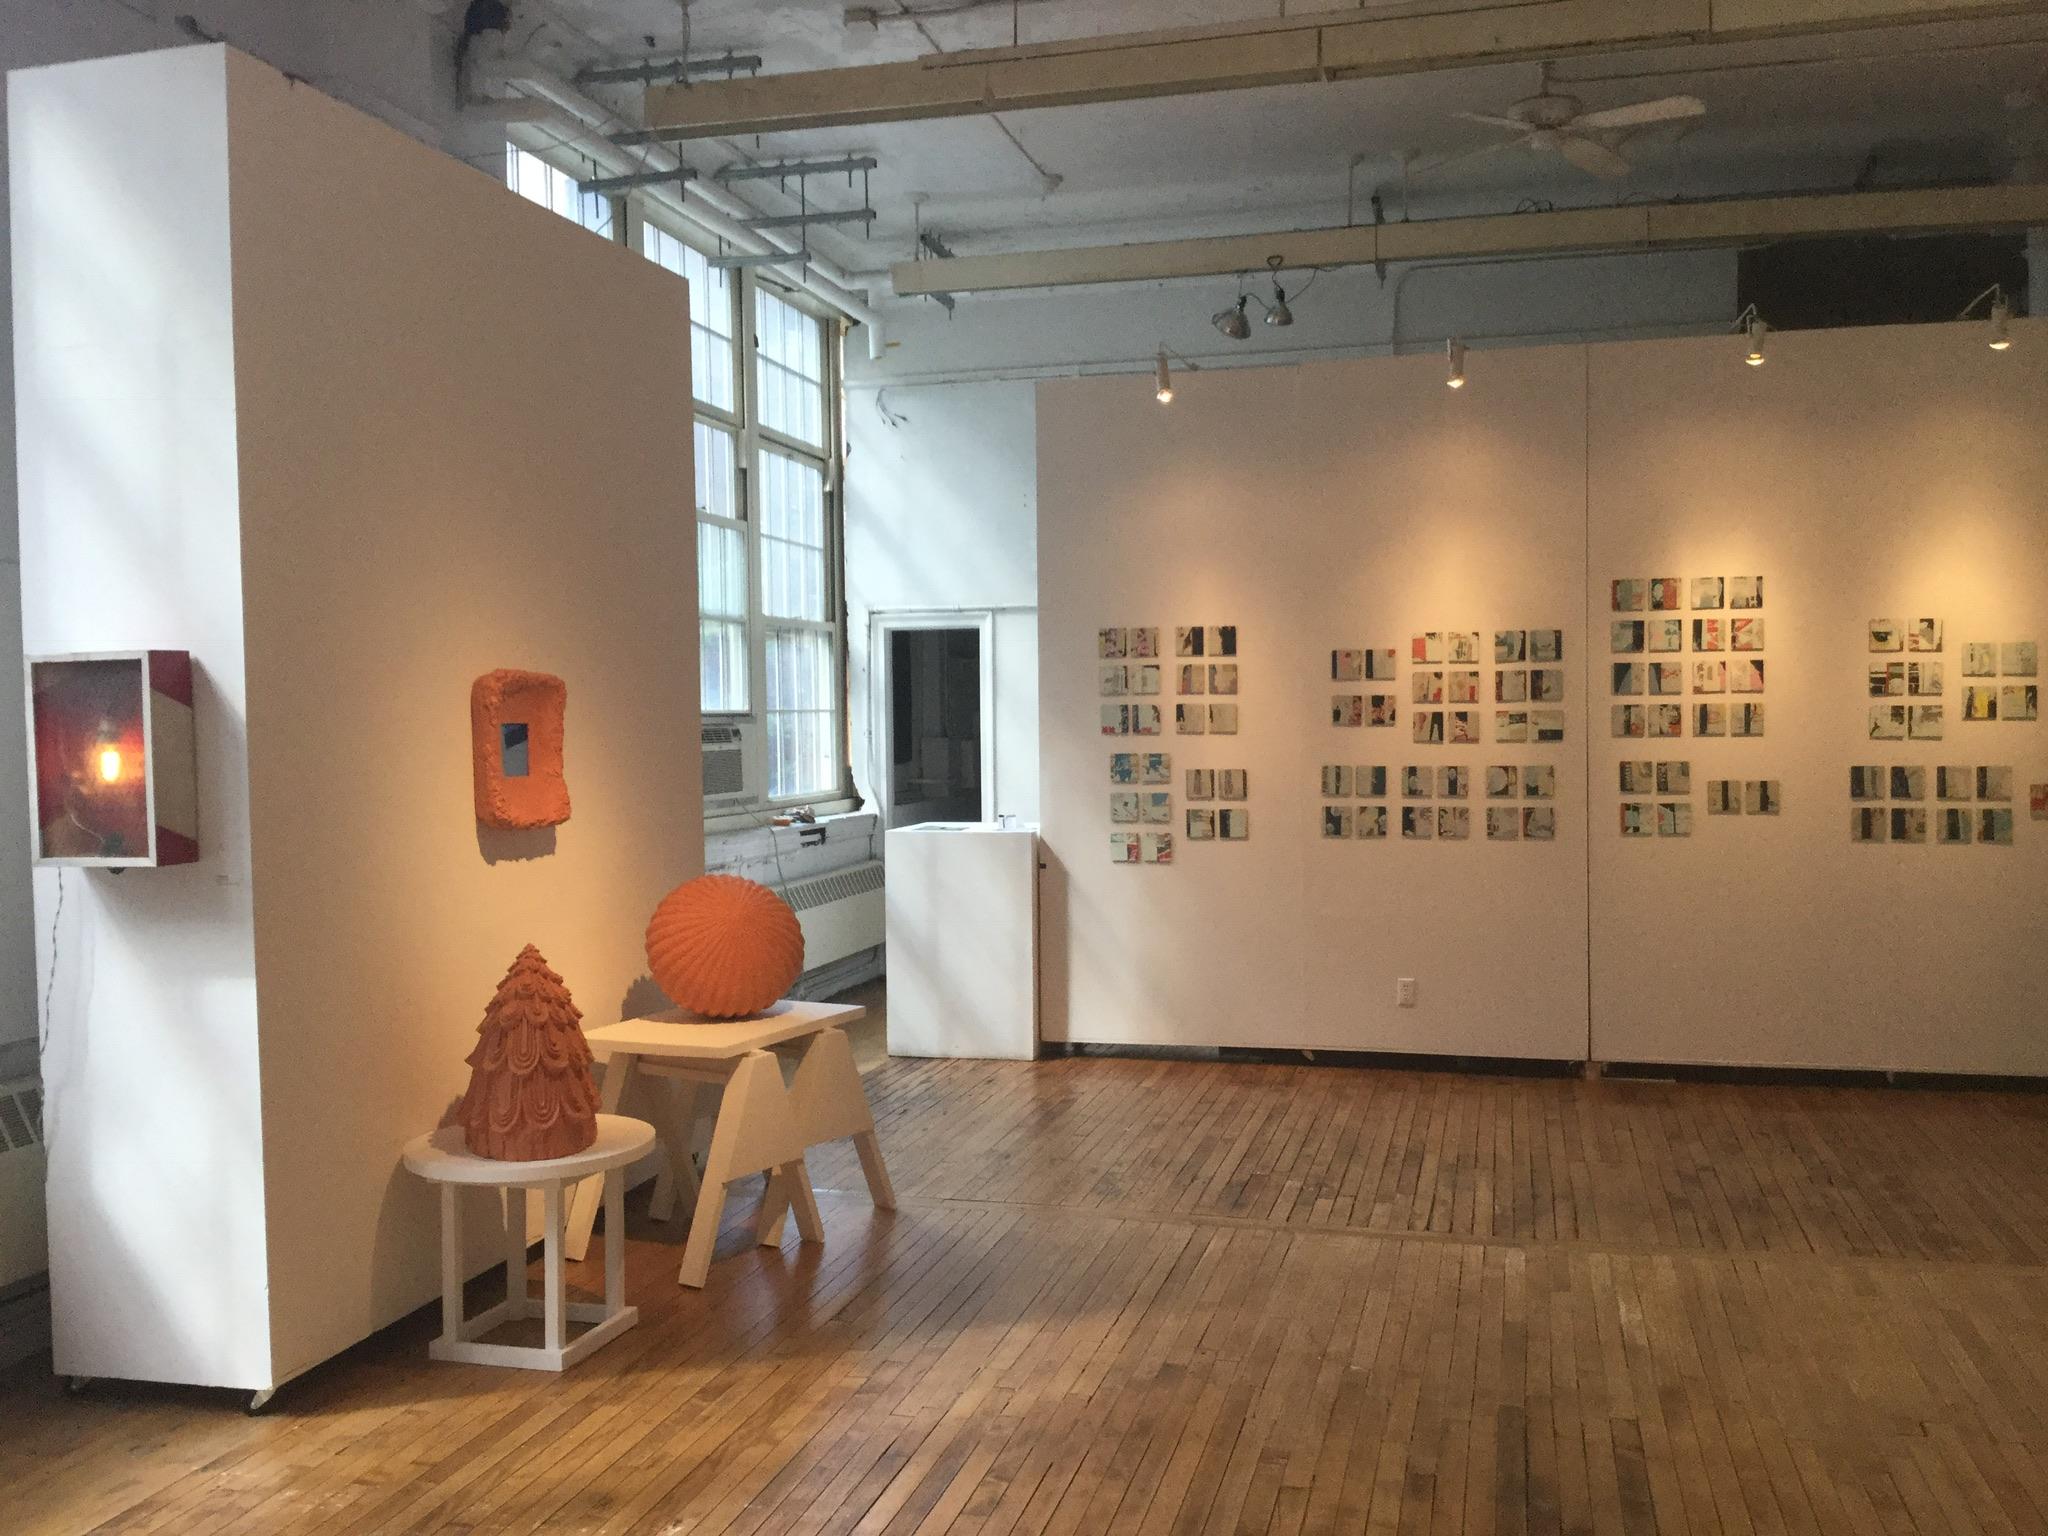 installation shot (upstairs)